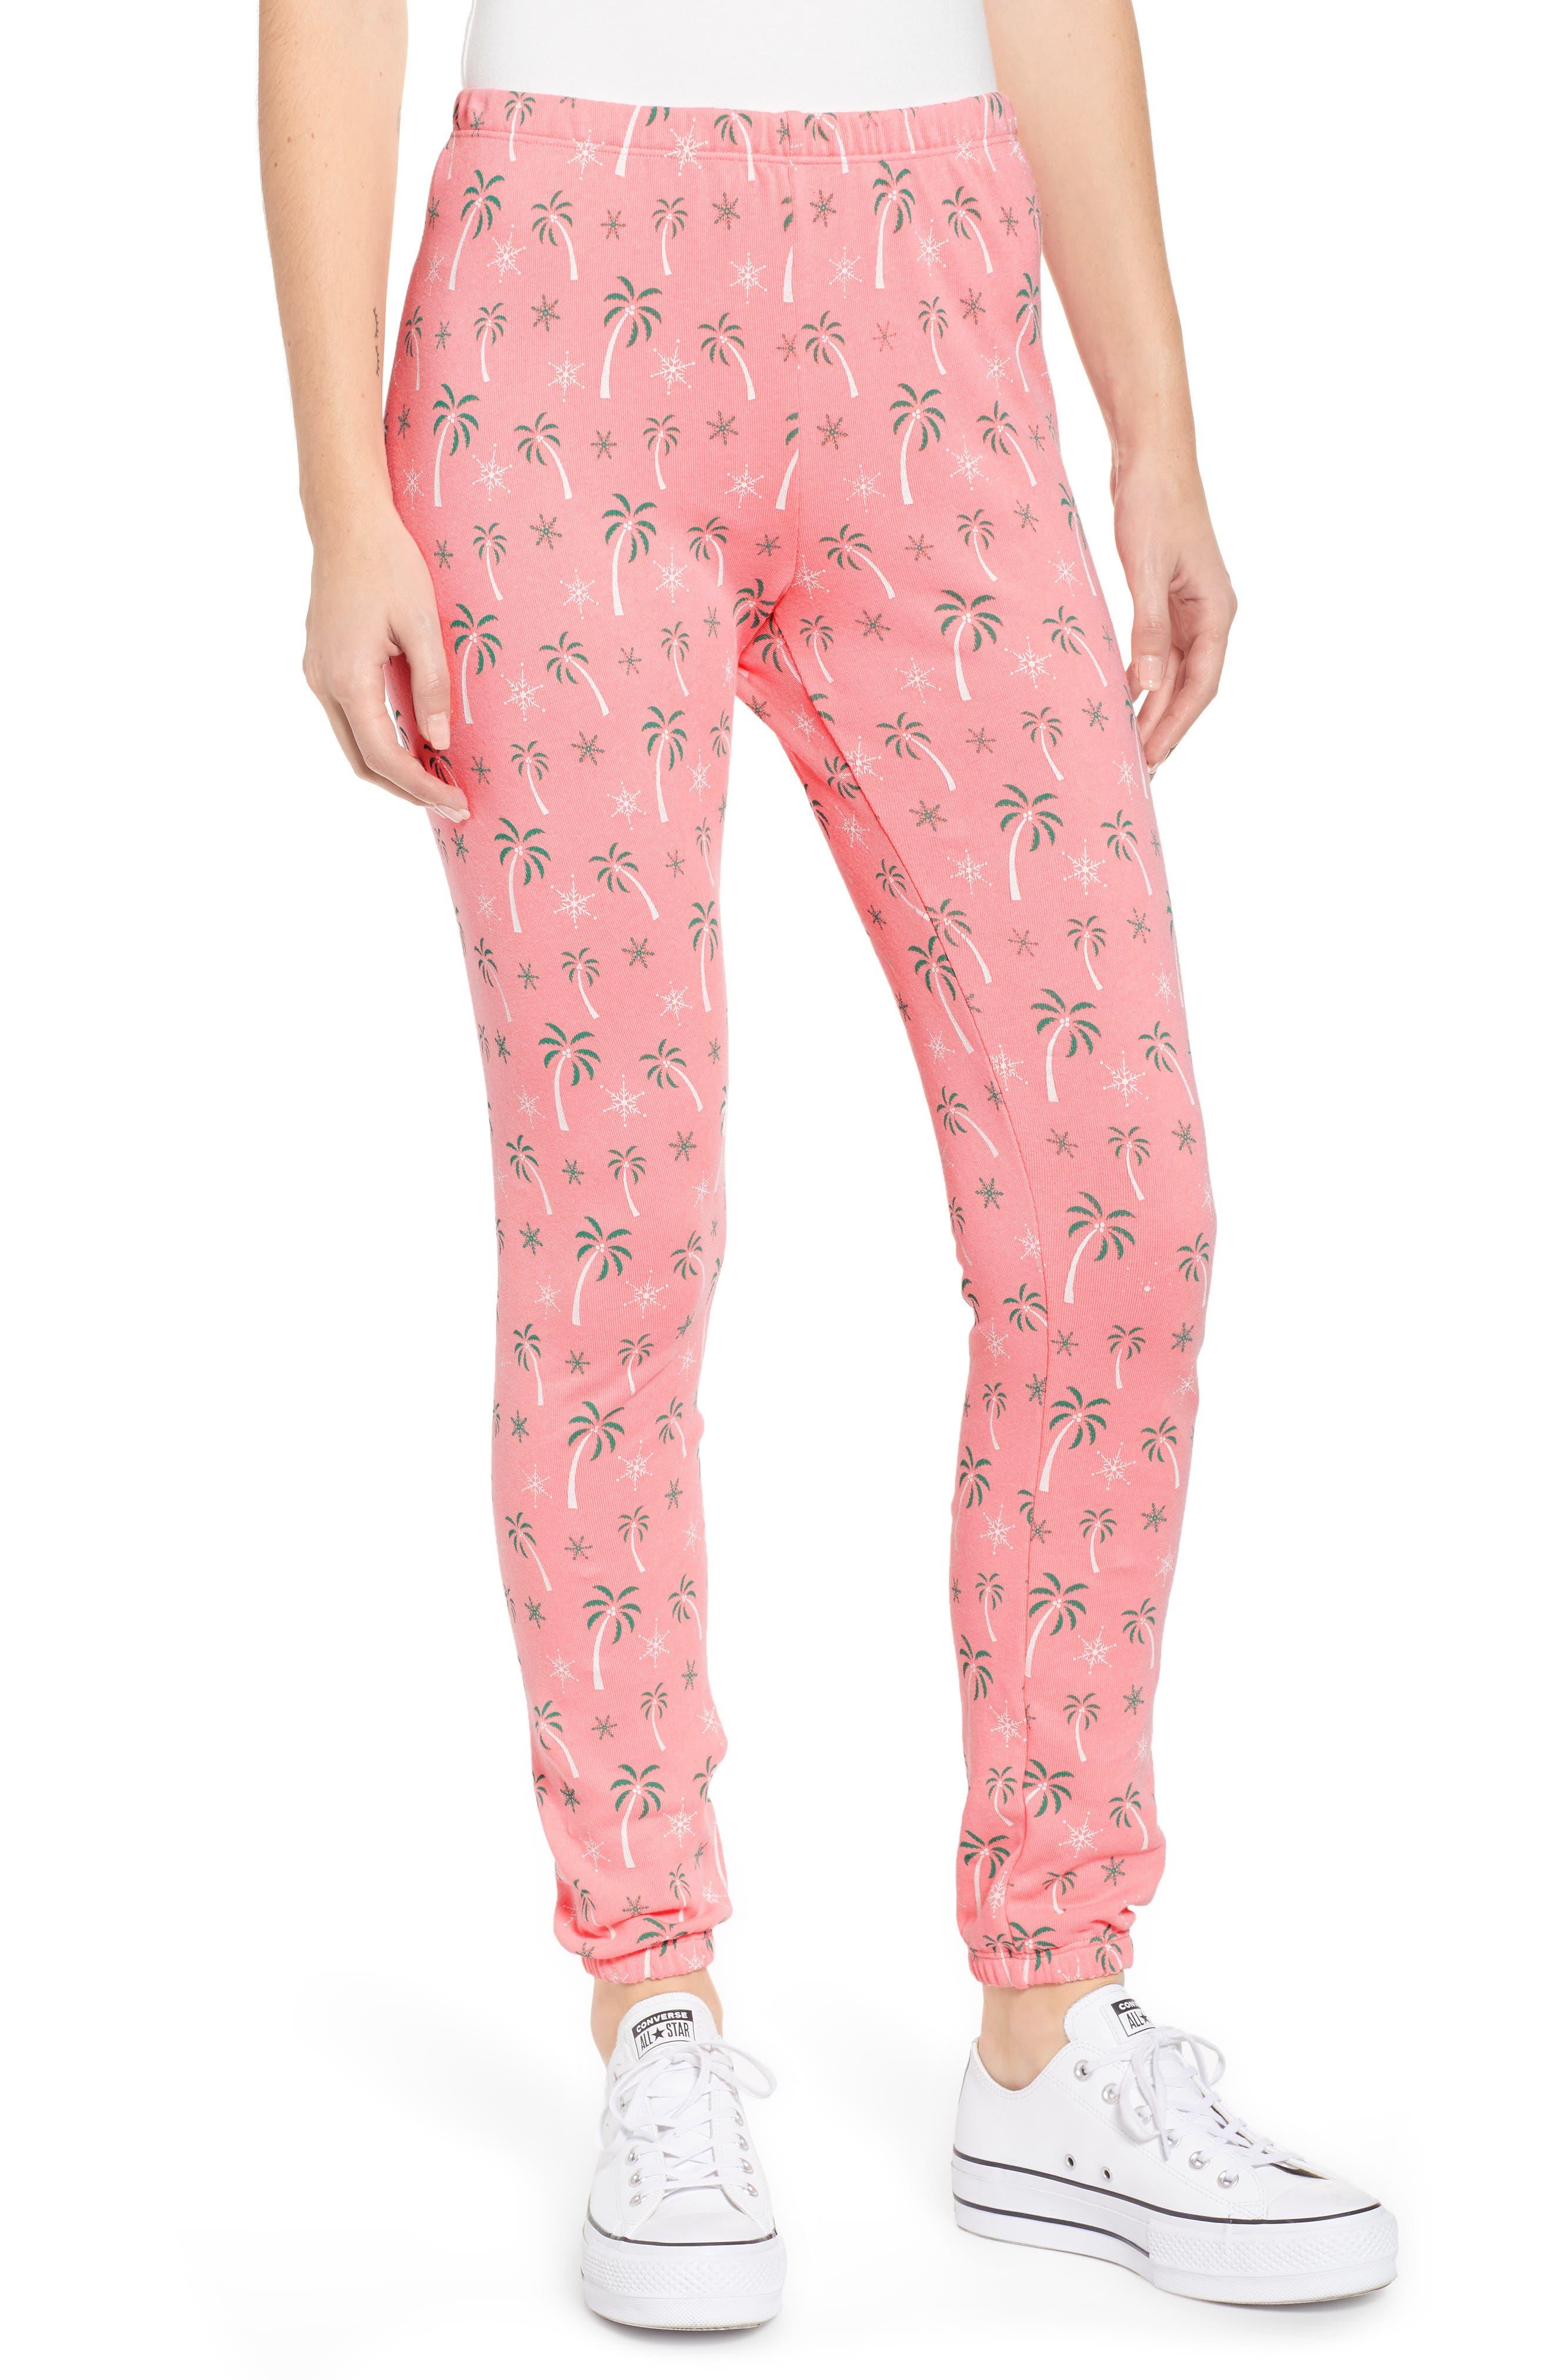 Tropical Christmas Sweatpants,                         Main,                         color, NEON SIGN